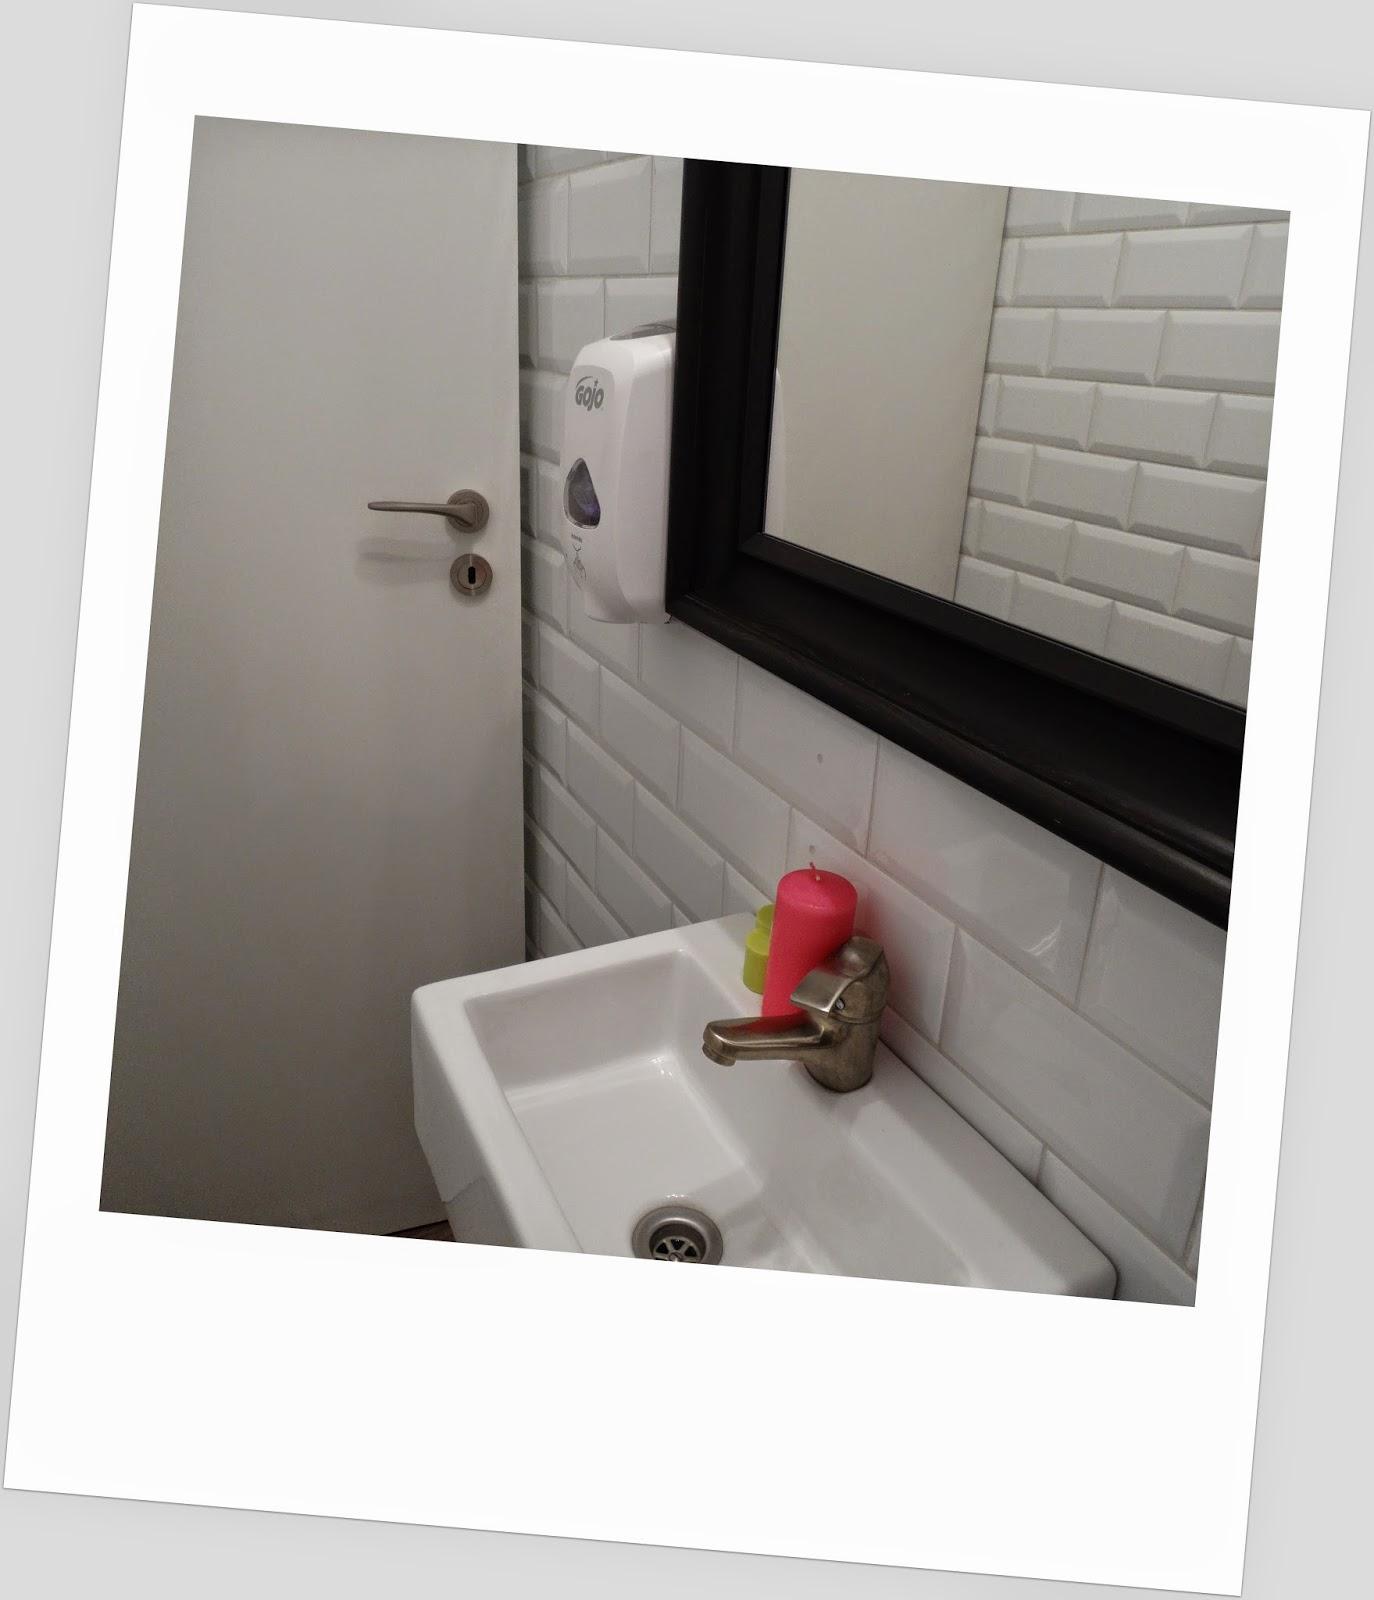 Zdrowe Love, kolorowa toaleta